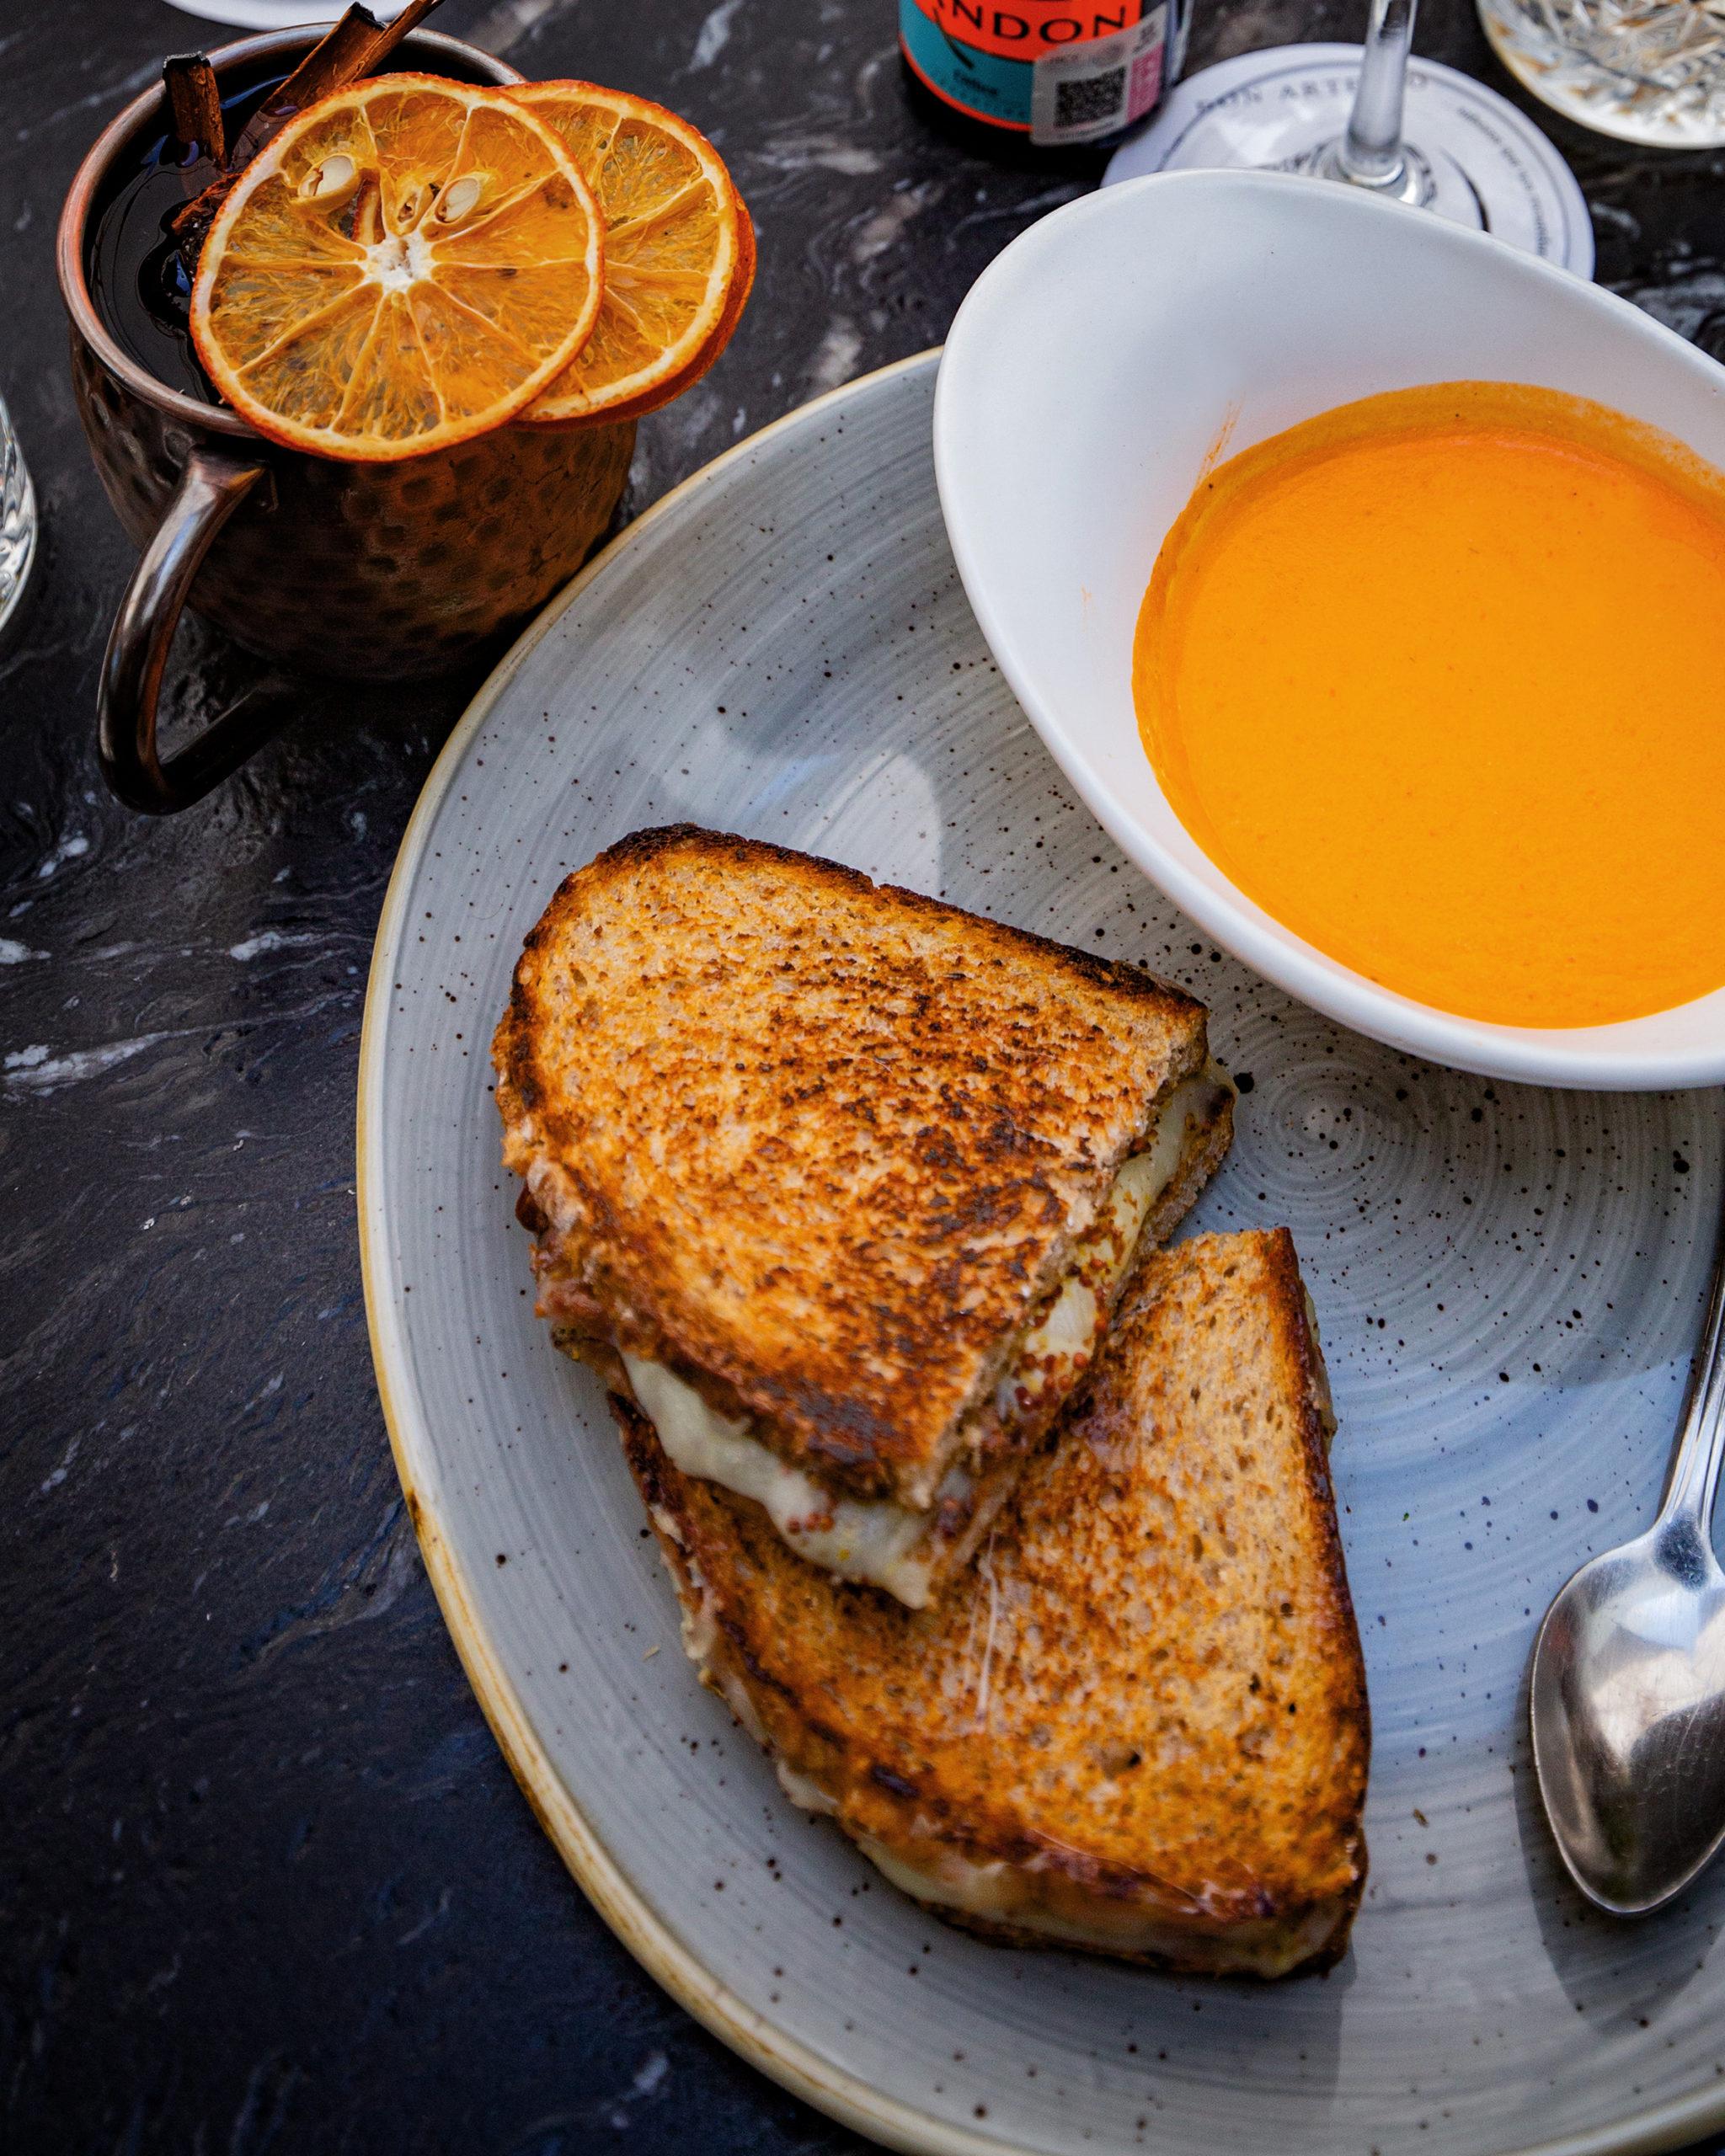 Grilled Cheese Sandwich con crema de tomate rostizado.